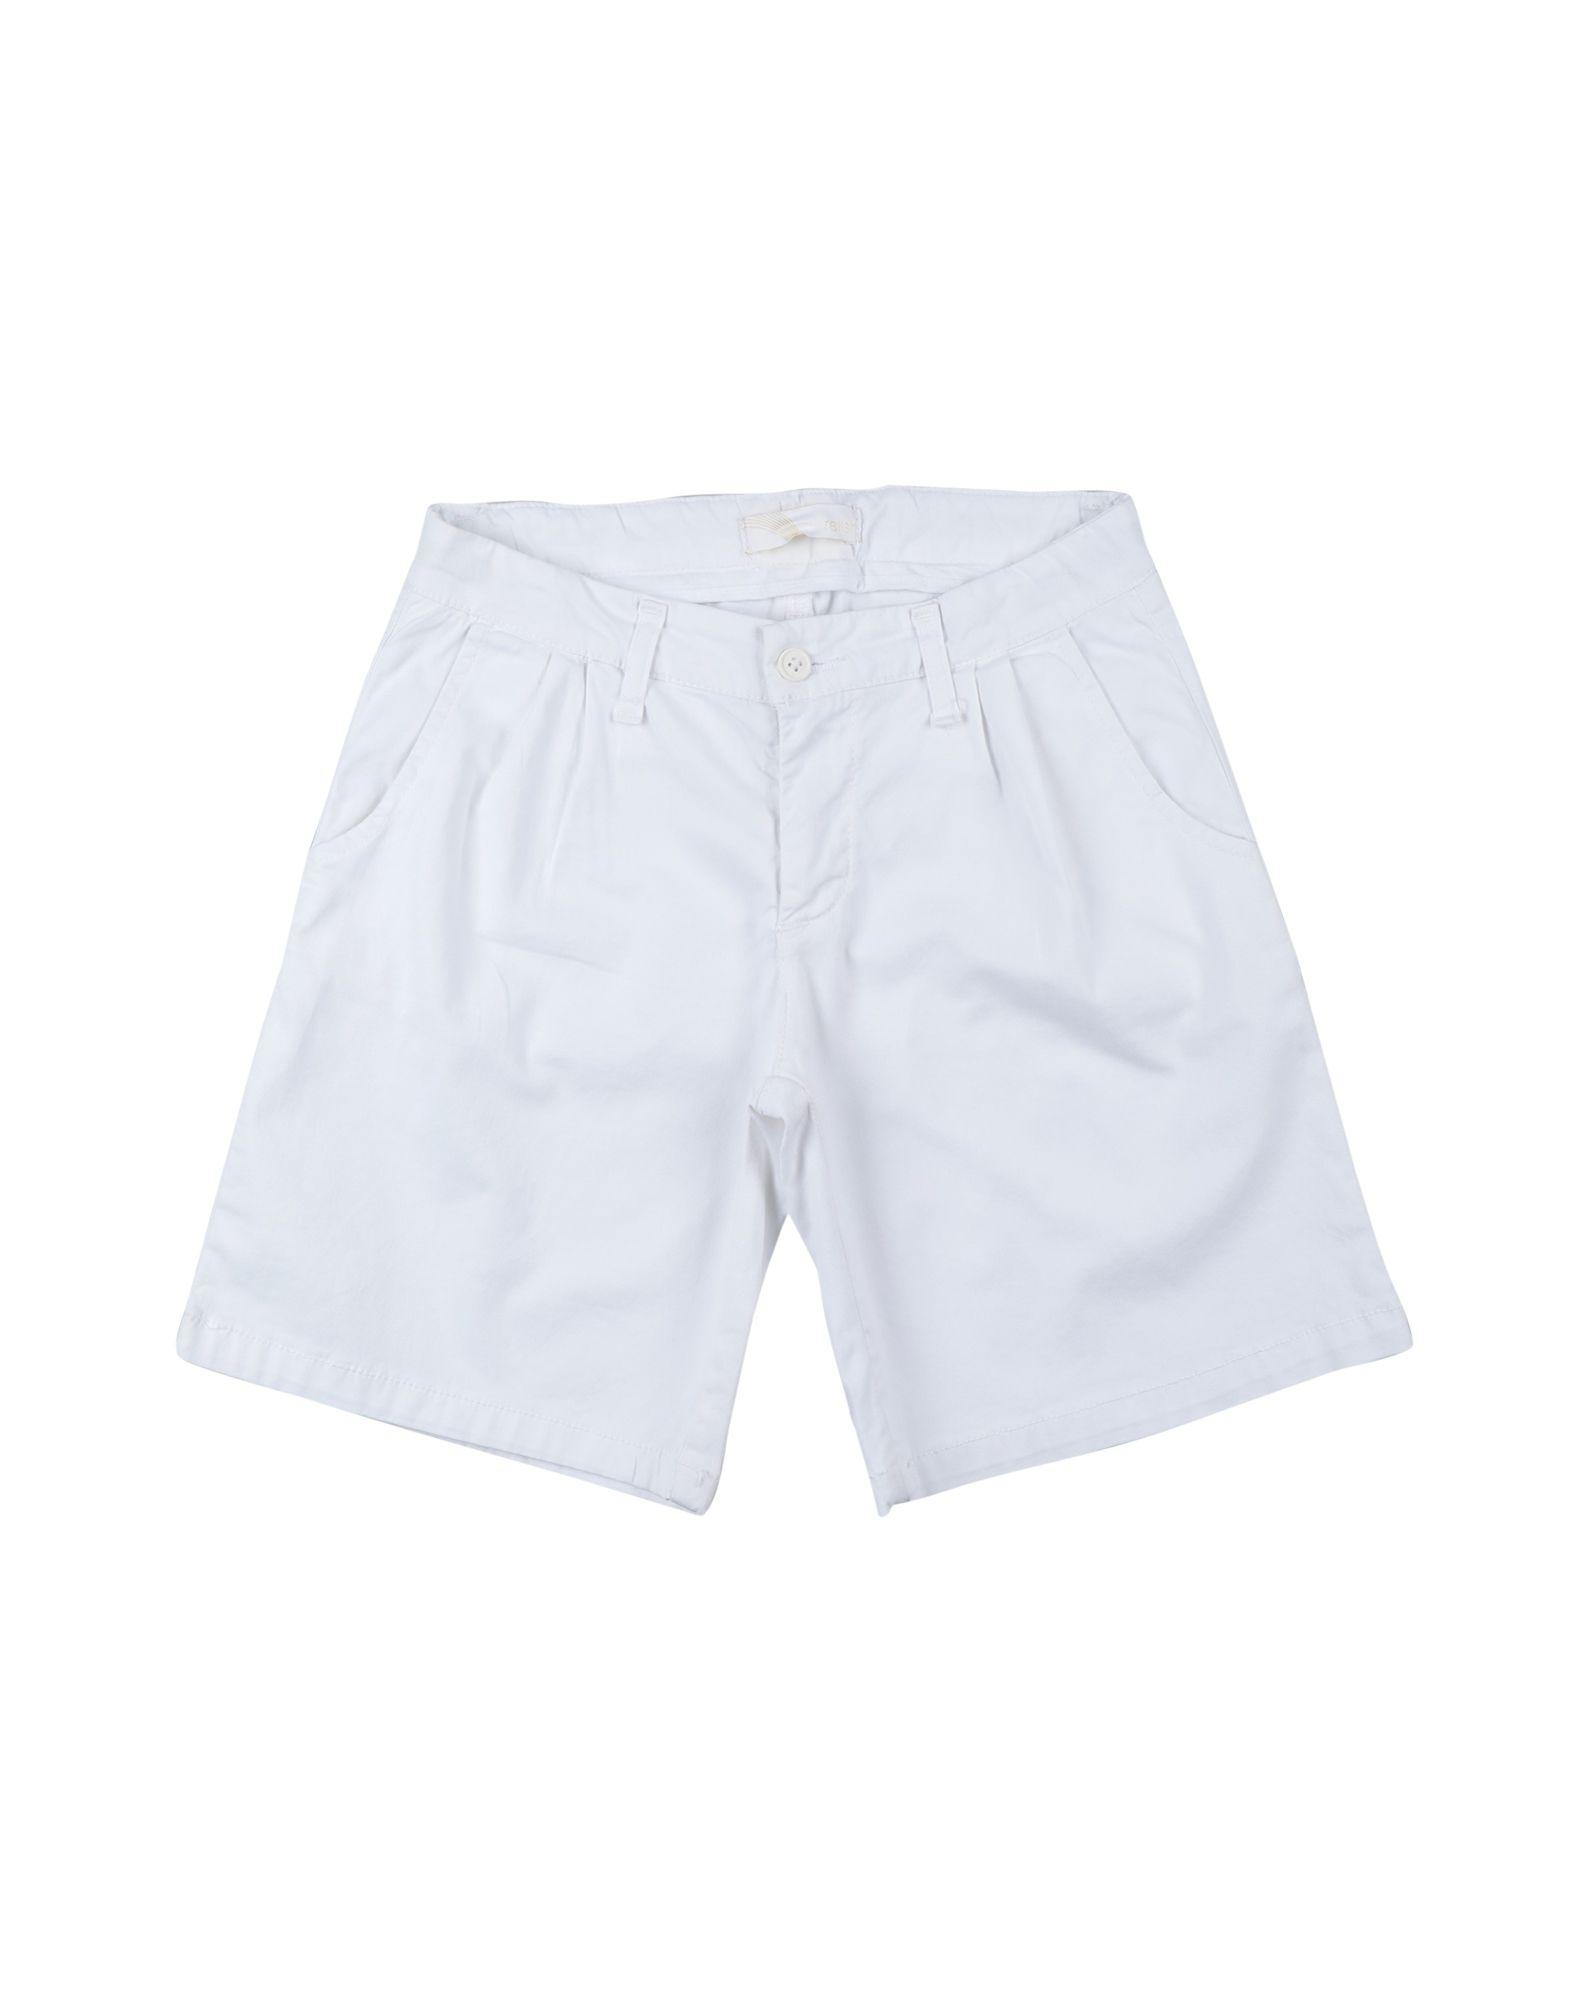 Relish Kids' Bermudas In White